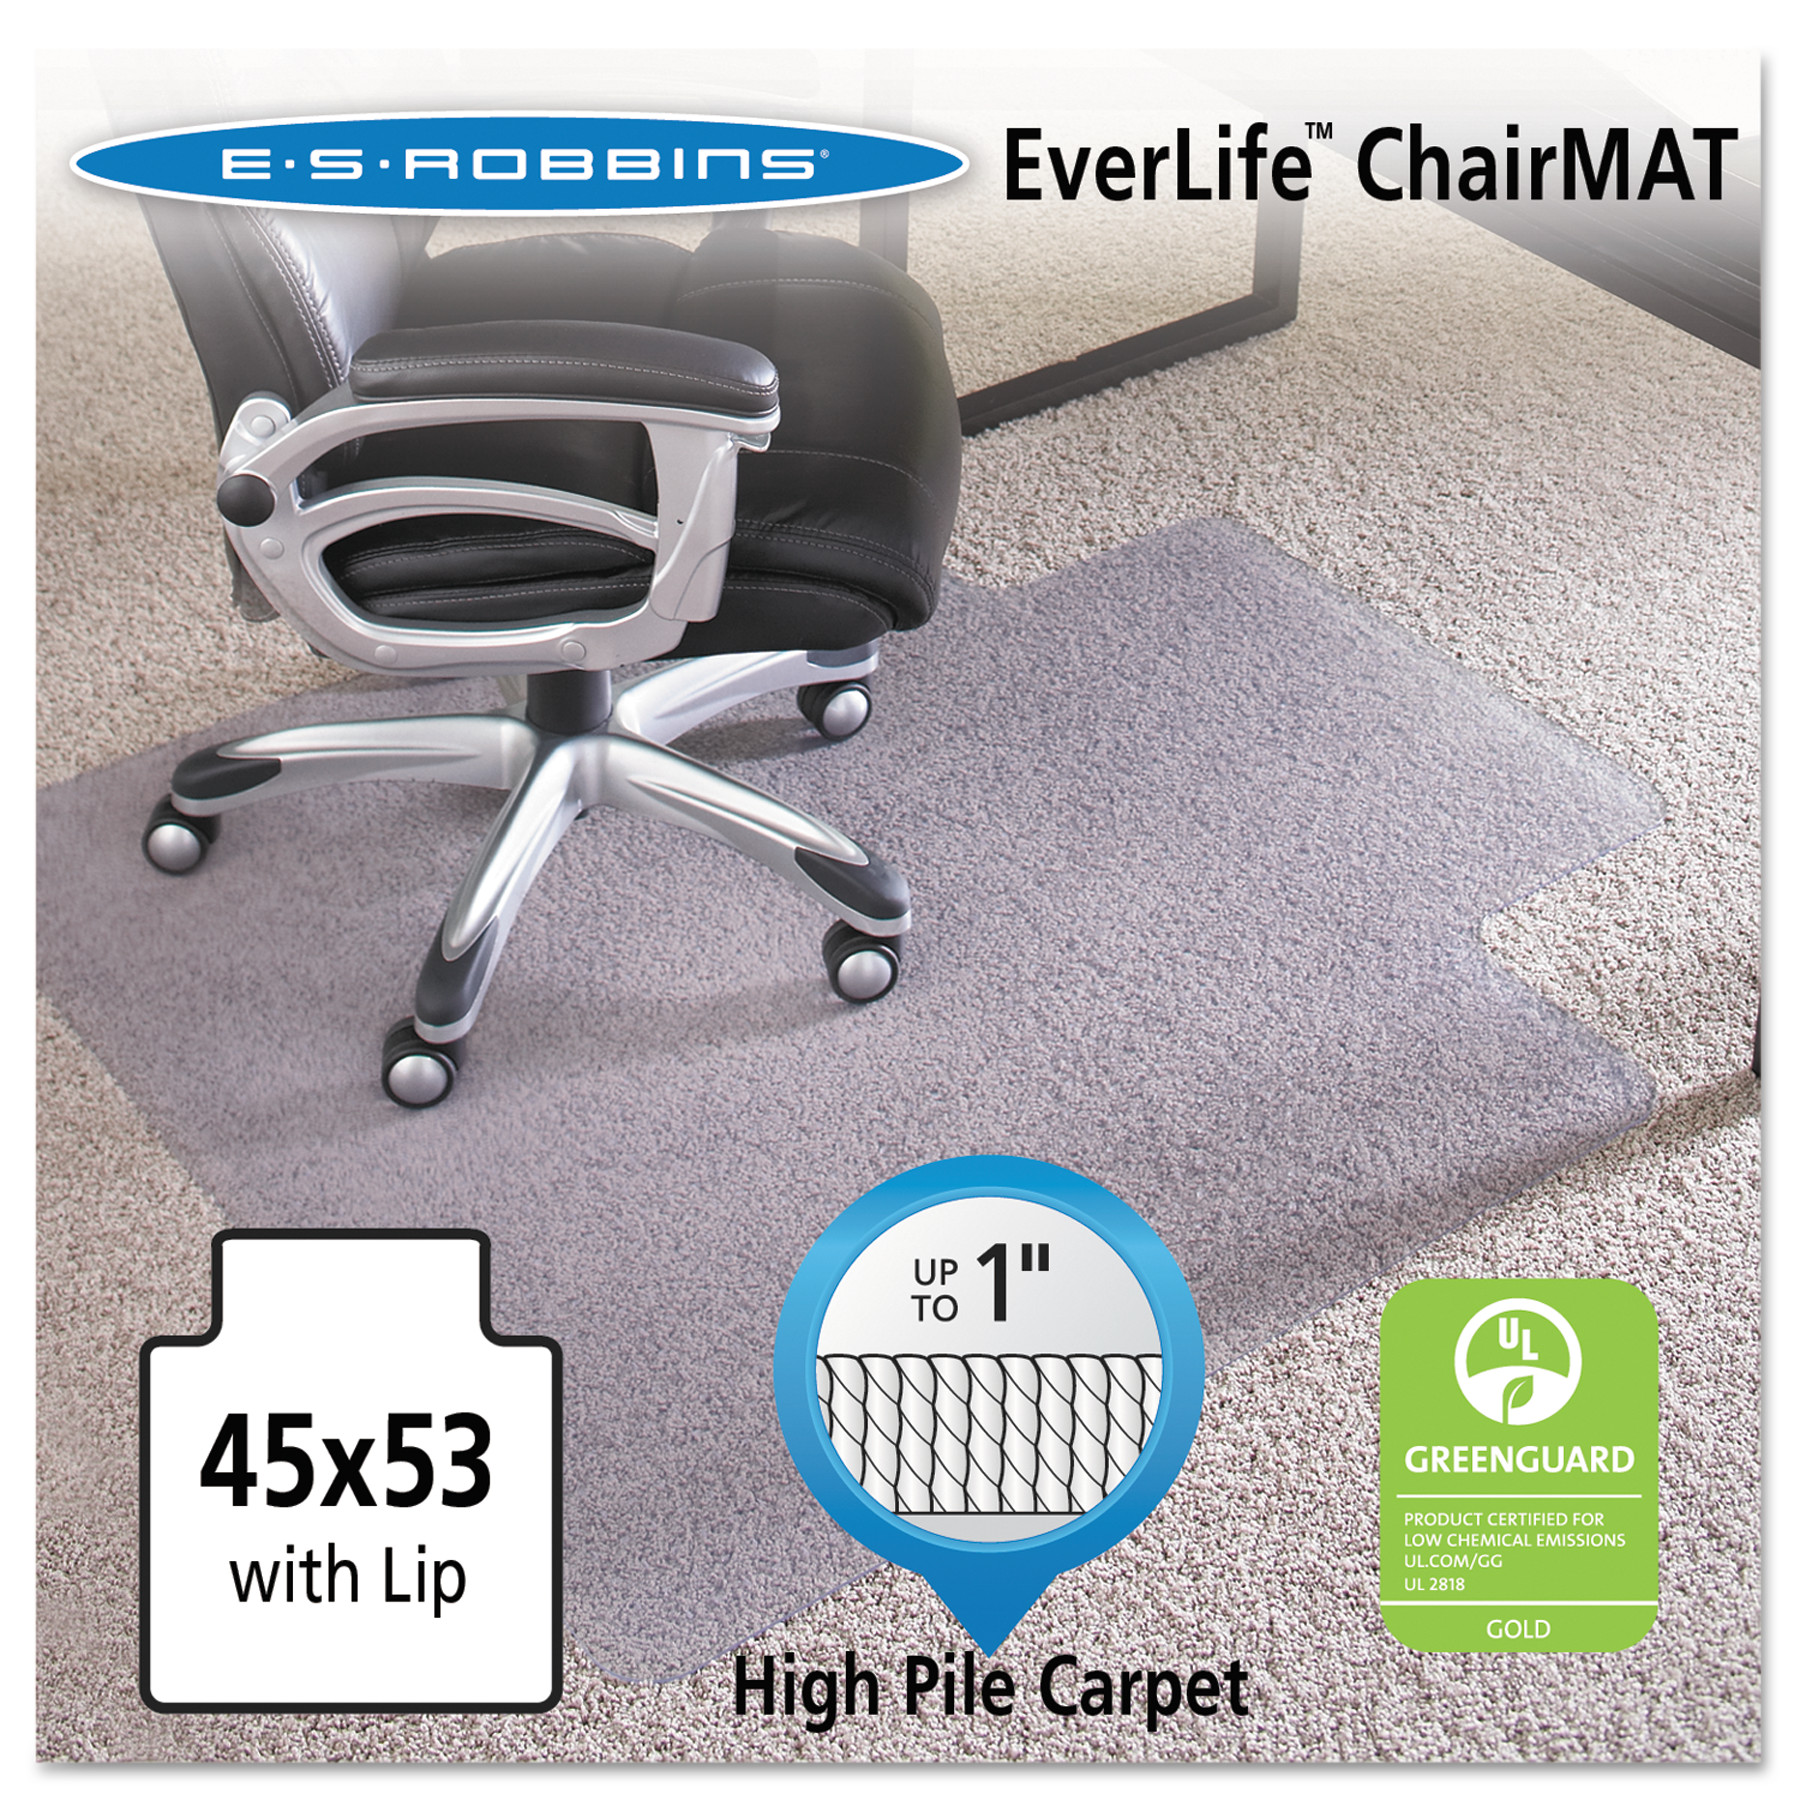 ES Robbins Performance Series 45 x 53 Chair Mat for High Pile Carpet, Rectangular with Lip